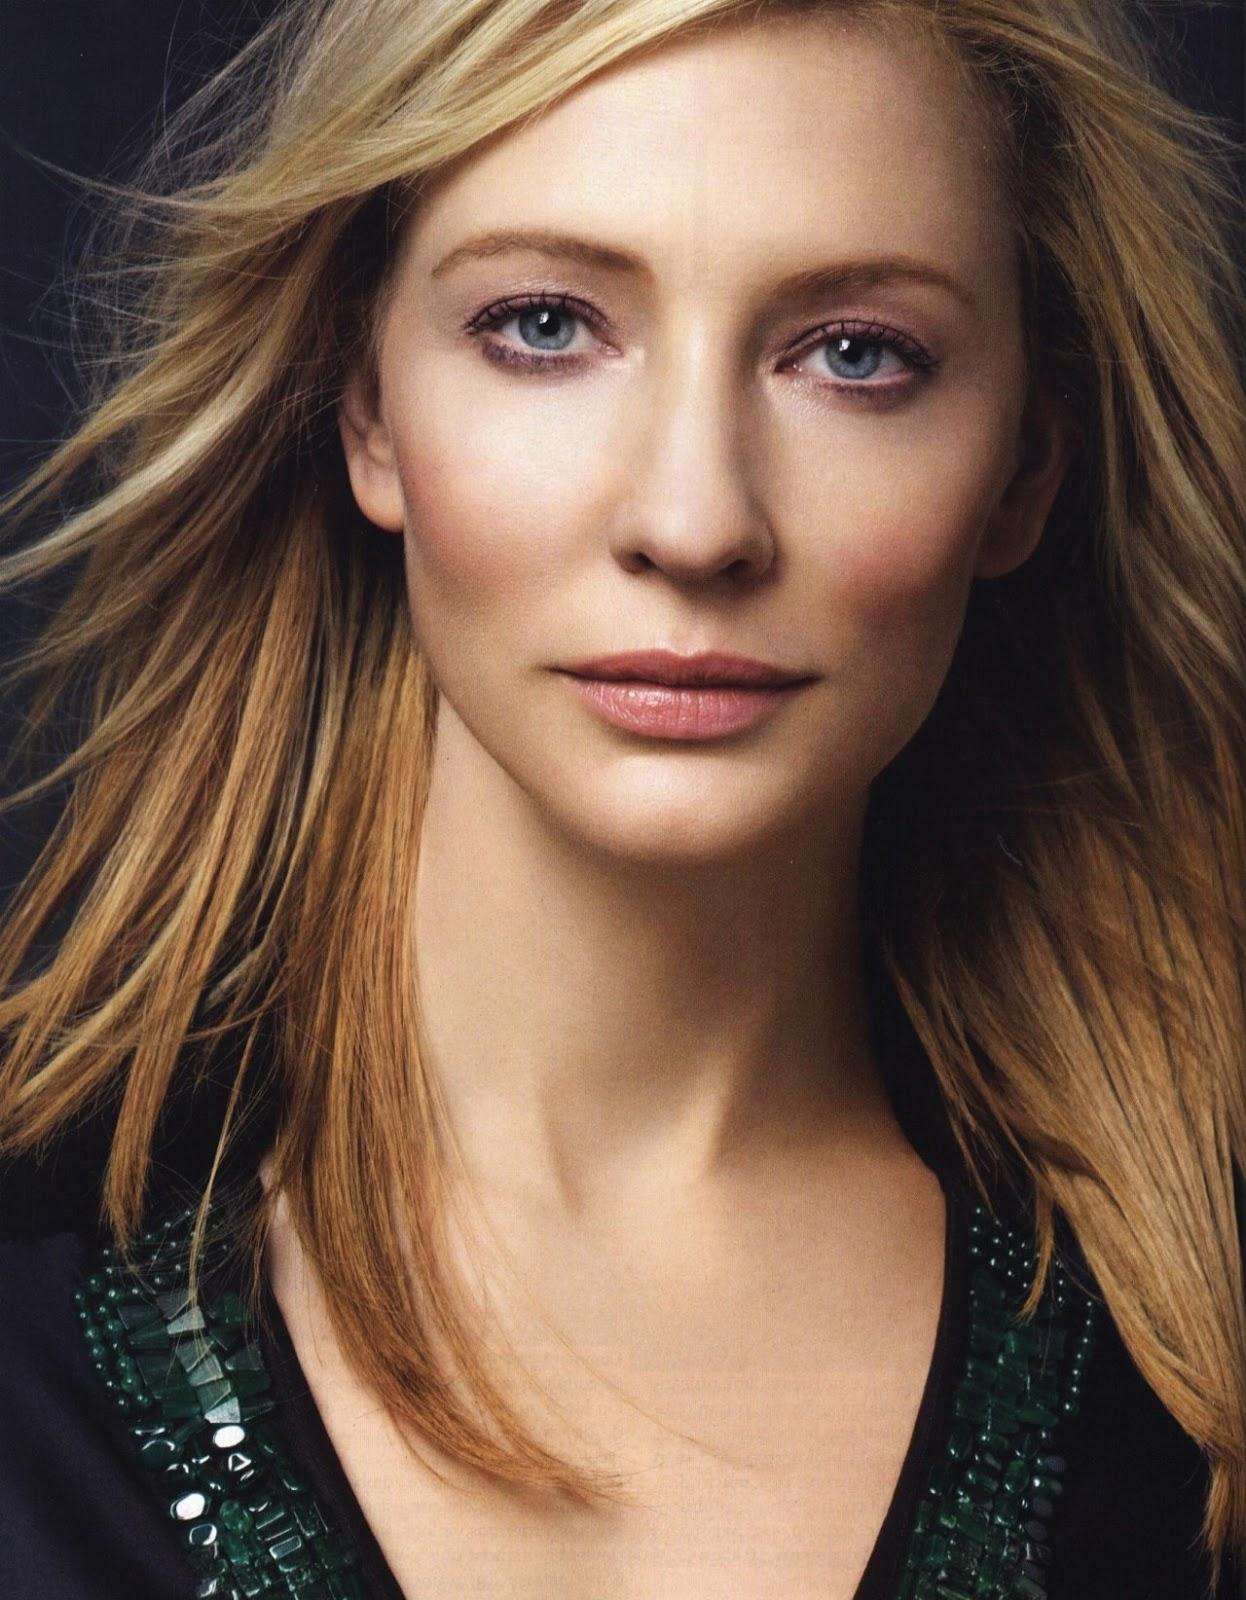 http://1.bp.blogspot.com/-vE-eu5KfWWw/UNiryazqWJI/AAAAAAAAAgU/tajq6I7WP9s/s1600/Cate+Blanchett+portrait.jpg